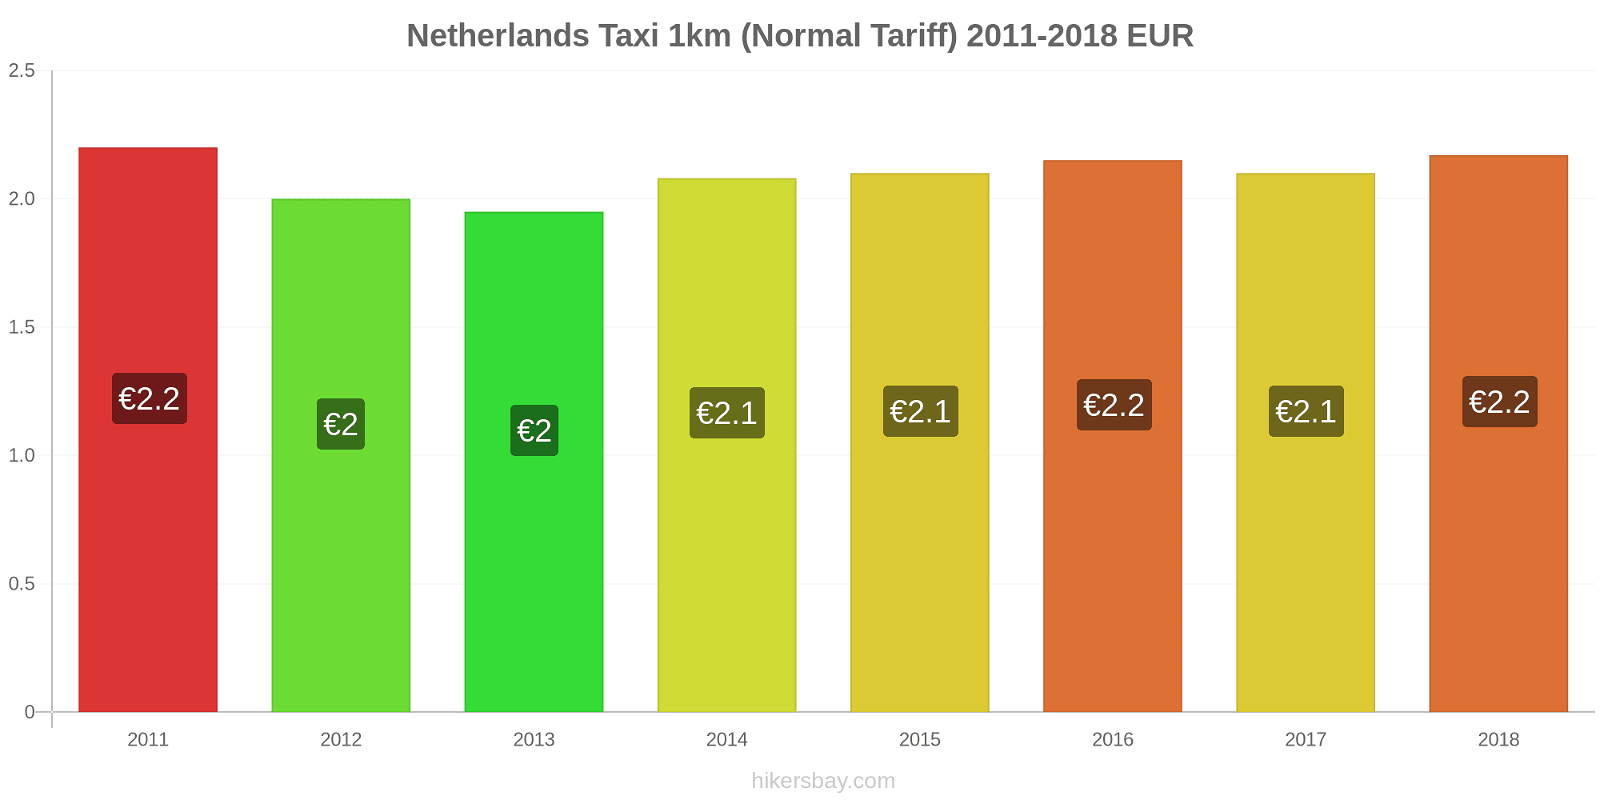 Netherlands price changes Taxi 1km (Normal Tariff) hikersbay.com